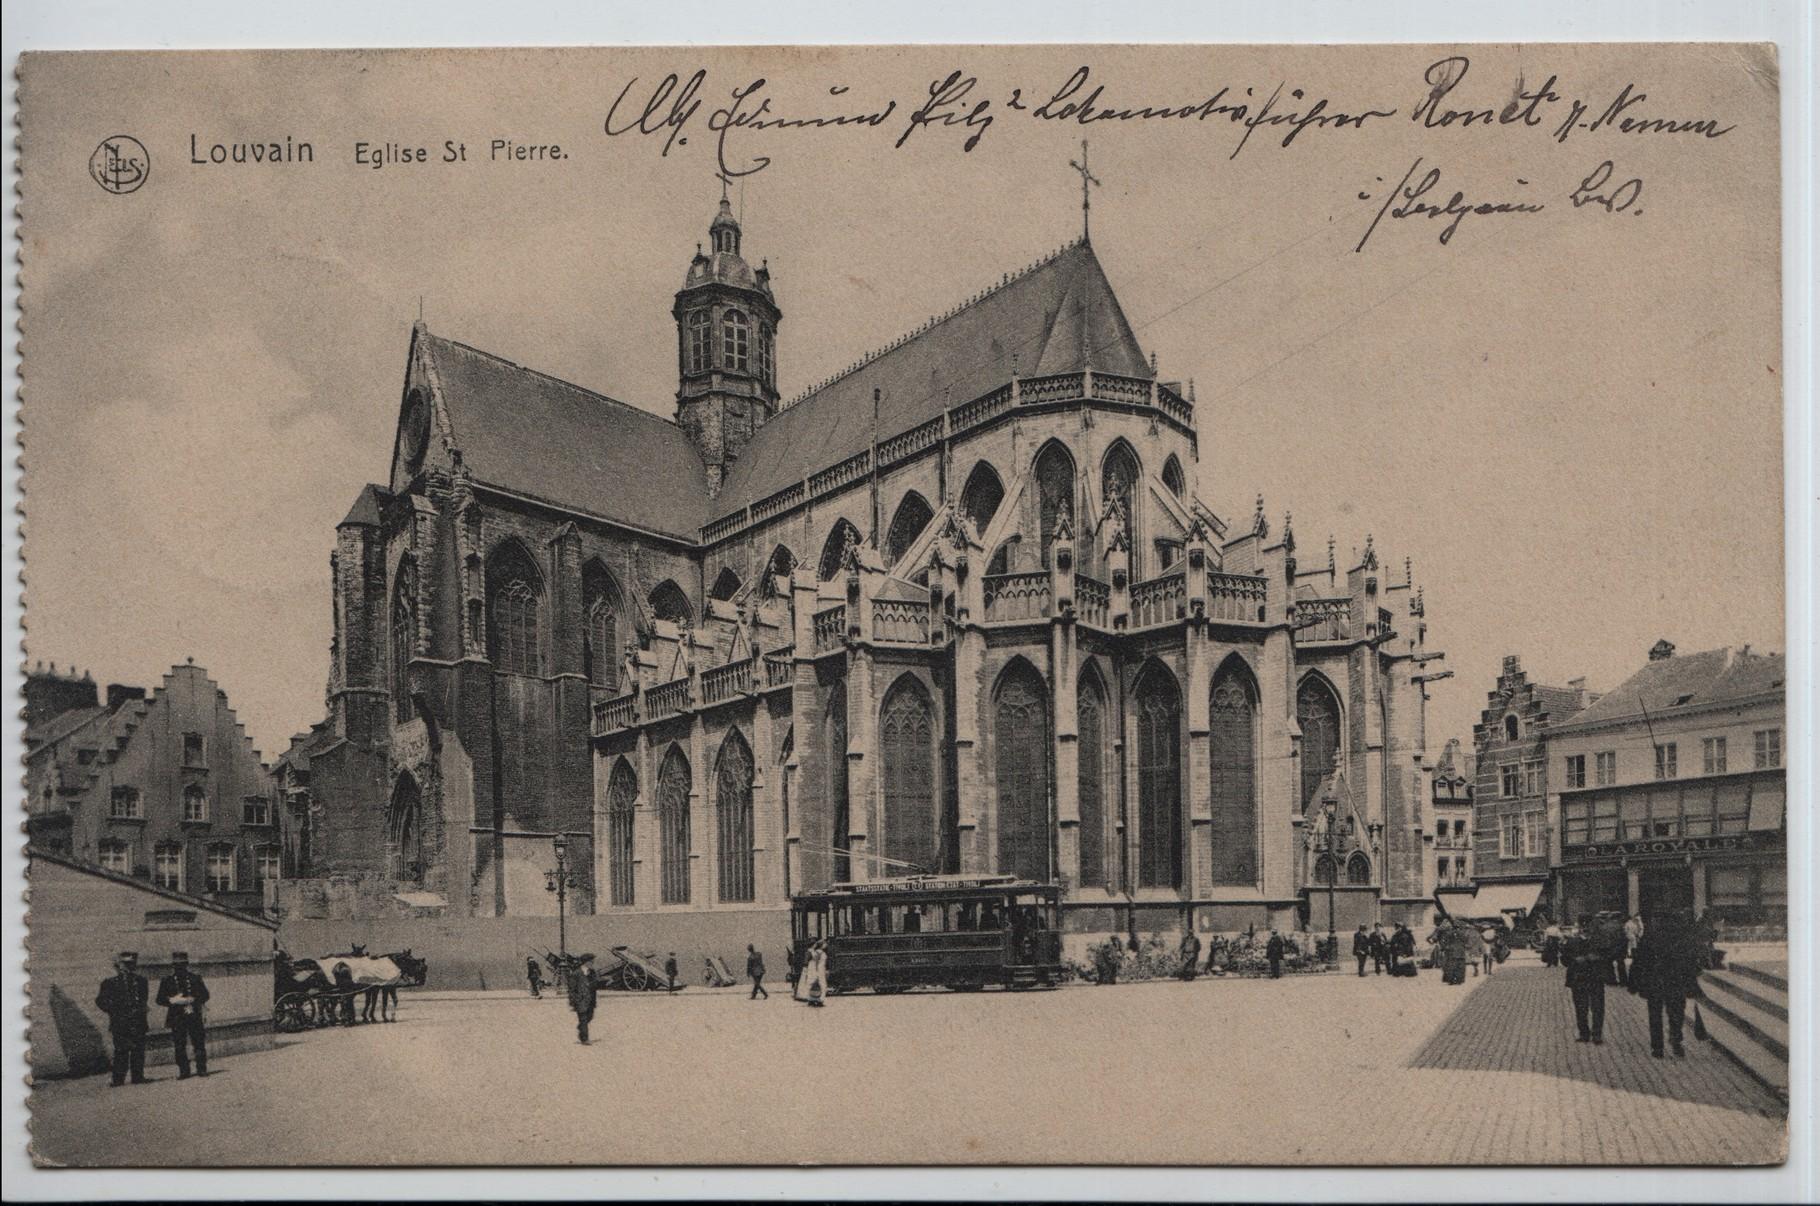 12. St Peter's church Louvain